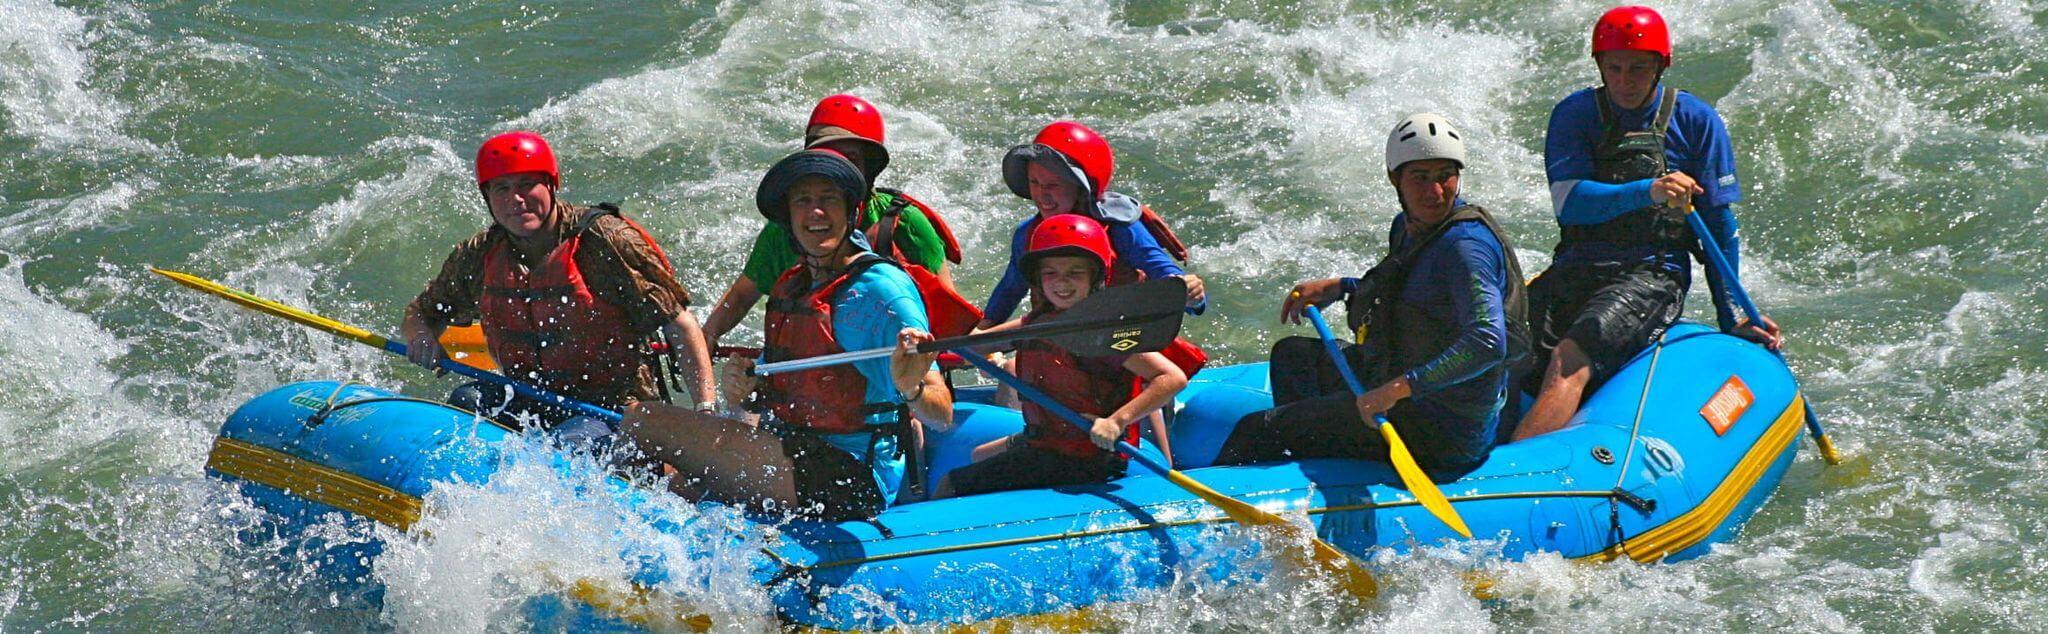 Rafting dans Audaux